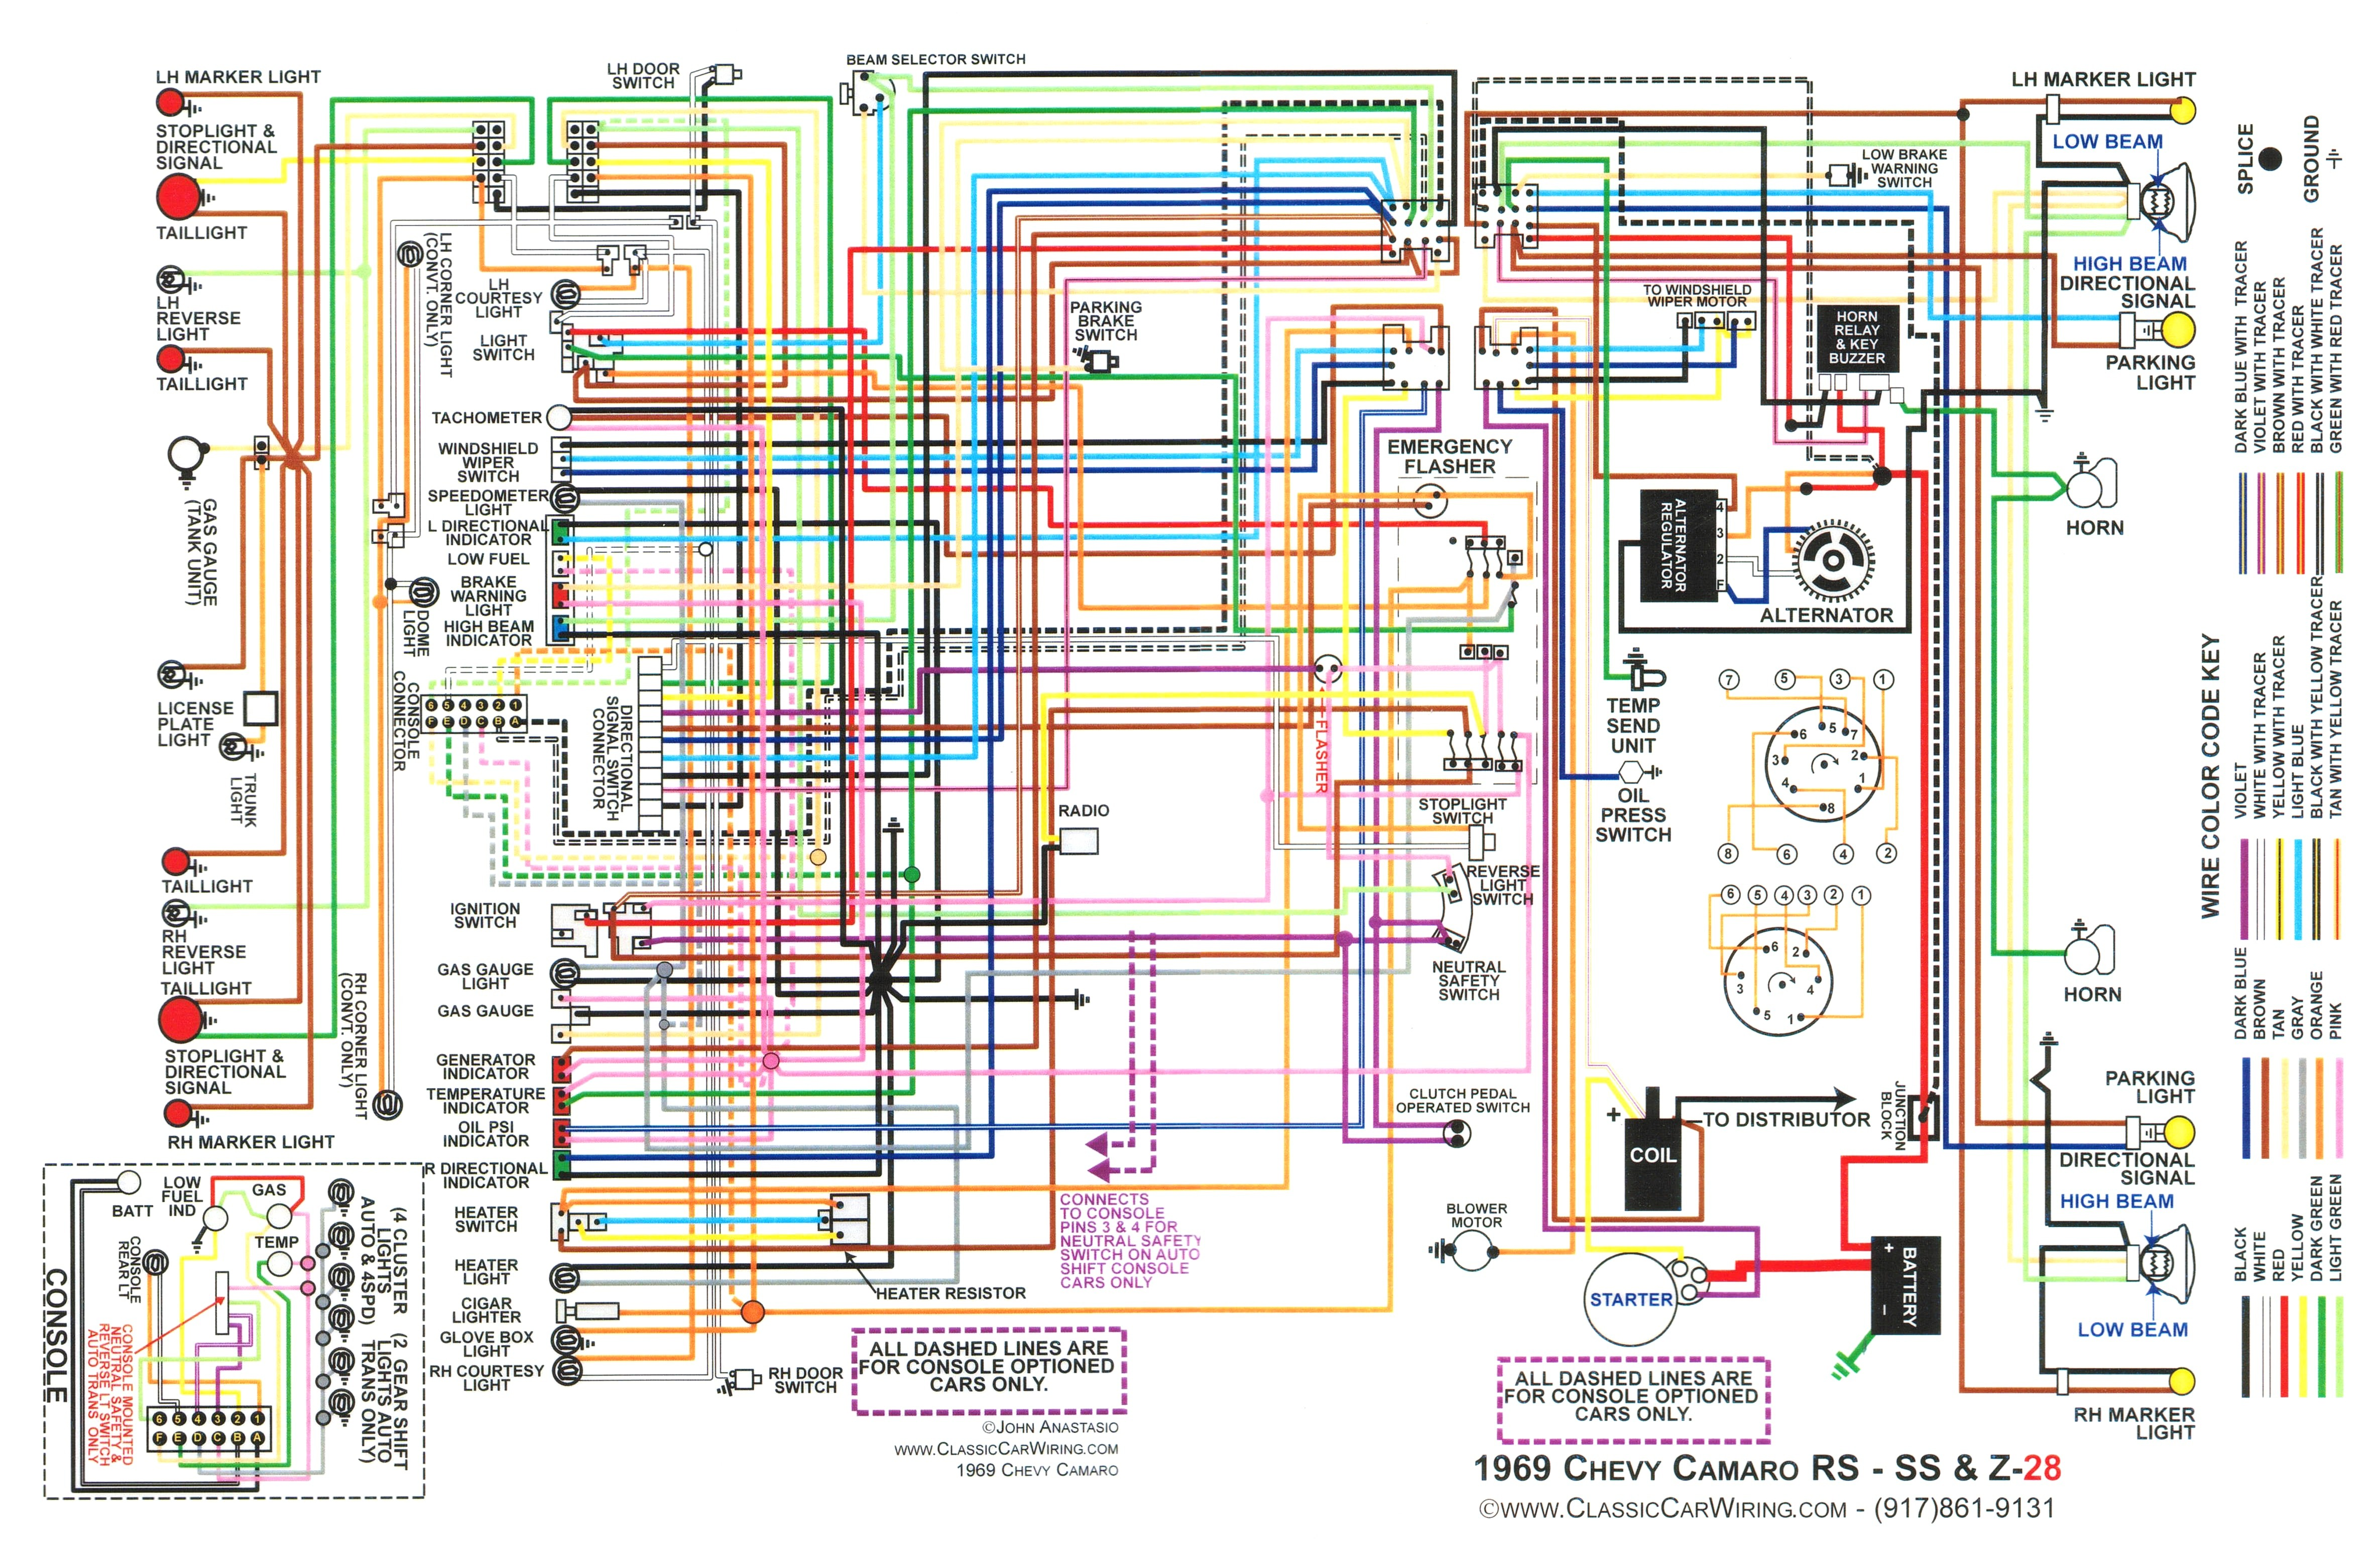 1967 firebird wiring diagram 1967 camaro wiring harness wiring diagram of 1967 firebird wiring diagram 2?quality\\\\\\\\\\\\\\\\\\\\\\\\\\\\\\\\\\\\\\\\\\\\\\\\\\\\\\\\\\\\\\\\\\\\\\\\\\\\\\\\\\\\\\\\\\\\\\\\\\\\\\\\\\\\\\\\\\\\\\\\\\\\\\\\\\\\\\\\\\\\\\\\\\\\\\\\\\\\\\\\\\\\\\\\\\\\\\\\\\\\\\\\\\\\\\\\\\\\\\\\\\\\\\\\\\\\\\\\\\\\\\\\\\\\\\\\\\\\\\\\\\\\\\\\\\\\\\\\\\\\\\\\\\\\\\\\\\\\\\\\\\\\\\\\\\\\\\\\\\\\\\\\\\\\\\\\\\\\\\\\\\\\\\\\\\\\\\\\\\\\\\\\\\\\\\\\\\\\\\\\\\\\\\\\\\\\\\\\\\\\\\\\\\\\\\\\\\\\\\\\\\\\\\\\\\\\\\\\\\\\\\\\\\\\\\\\\\\\\\\\\\\\\\\\\\\\\\\\\\\\\\\\\\\\\\\\\\\\\\\\\\\\\\\\\\\\\\\\\\\\\\\\\\\\\\\\\\\\\\\\\\\\\\\\\\\\\\\\\\\\\\\\\\\\\\\\\\\\\\\\\\\\\\\\\\\\\\\\\\\\\\\\\\\\\\\\\\\\\\\\\\\\\\\\\\\\\\\\\\\\\\\\\\\\\\\\\\\\\\\\\\\\\\\\\\\\\\\\\\\\\\\\\\\\\\\\\\\\\\\\\\\\\\\\\\\\\\\\\\\\\\\\\\\\\\\\\\\\\\\\\\\\\\\\\\\\\\\\\\\\\\\\\\\\\\\\\\\\\\\\\\\\\\\\\\\\\\\\\\\\\\\\\\\\\\\\\\\\\\\\\\\\\\\\\\\\\\\\\\\\\\\\\\\\\\\\\\\\\\\\\\\\\\\\\\\\\\\\\\\\\\\\\\\\\\\\\\\\\\\\\\\\\\\\\\\\\\\\\\\\\\\\\\\\\\\\\\\\\\\\\\\\\\\\\\\\\\\\\\\\\\\\\\\\\\\\\\\\\\\\\\\\\\\\\\\\\\\\\\\\\\\\\\\\\\\\\\\\\\\\\\\\\\\\\\\\\\\\\\\\\\\=80\\\\\\\\\\\\\\\\\\\\\\\\\\\\\\\\\\\\\\\\\\\\\\\\\\\\\\\\\\\\\\\\\\\\\\\\\\\\\\\\\\\\\\\\\\\\\\\\\\\\\\\\\\\\\\\\\\\\\\\\\\\\\\\\\\\\\\\\\\\\\\\\\\\\\\\\\\\\\\\\\\\\\\\\\\\\\\\\\\\\\\\\\\\\\\\\\\\\\\\\\\\\\\\\\\\\\\\\\\\\\\\\\\\\\\\\\\\\\\\\\\\\\\\\\\\\\\\\\\\\\\\\\\\\\\\\\\\\\\\\\\\\\\\\\\\\\\\\\\\\\\\\\\\\\\\\\\\\\\\\\\\\\\\\\\\\\\\\\\\\\\\\\\\\\\\\\\\\\\\\\\\\\\\\\\\\\\\\\\\\\\\\\\\\\\\\\\\\\\\\\\\\\\\\\\\\\\\\\\\\\\\\\\\\\\\\\\\\\\\\\\\\\\\\\\\\\\\\\\\\\\\\\\\\\\\\\\\\\\\\\\\\\\\\\\\\\\\\\\\\\\\\\\\\\\\\\\\\\\\\\\\\\\\\\\\\\\\\\\\\\\\\\\\\\\\\\\\\\\\\\\\\\\\\\\\\\\\\\\\\\\\\\\\\\\\\\\\\\\\\\\\\\\\\\\\\\\\\\\\\\\\\\\\\\\\\\\\\\\\\\\\\\\\\\\\\\\\\\\\\\\\\\\\\\\\\\\\\\\\\\\\\\\\\\\\\\\\\\\\\\\\\\\\\\\\\\\\\\\\\\\\\\\\\\\\\\\\\\\\\\\\\\\\\\\\\\\\\\\\\\\\\\\\\\\\\\\\\\\\\\\\\\\\\\\\\\\\\\\\\\\\\\\\\\\\\\\\\\\\\\\\\\\\\\\\\\\\\\\\\\\\\\\\\\\\\\\\\\\\\\\